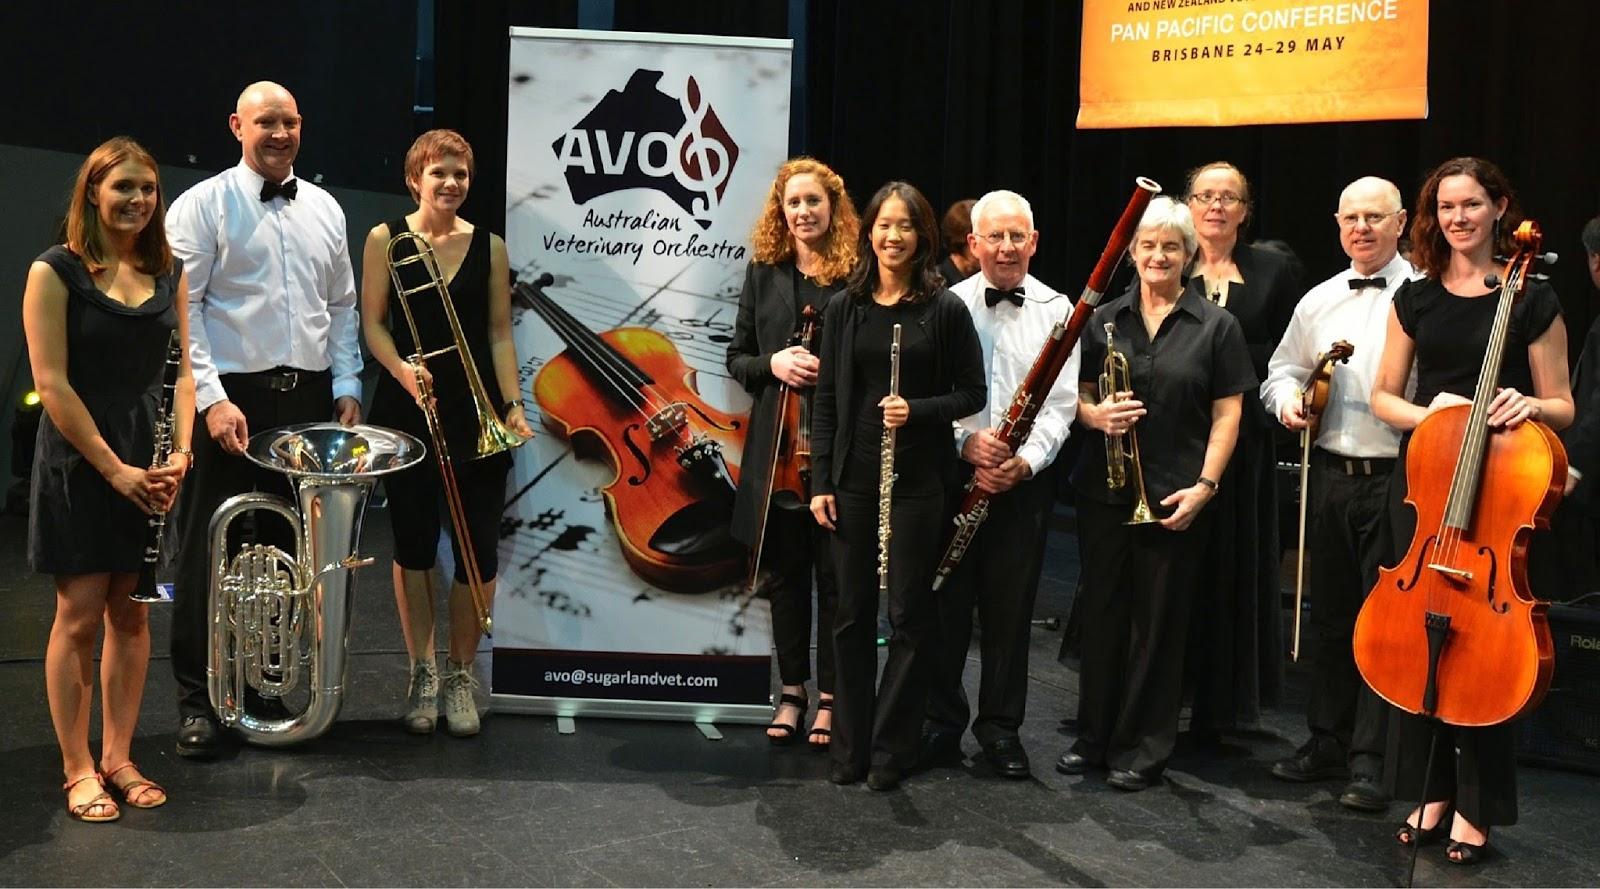 Australian Veterinary Orchestra